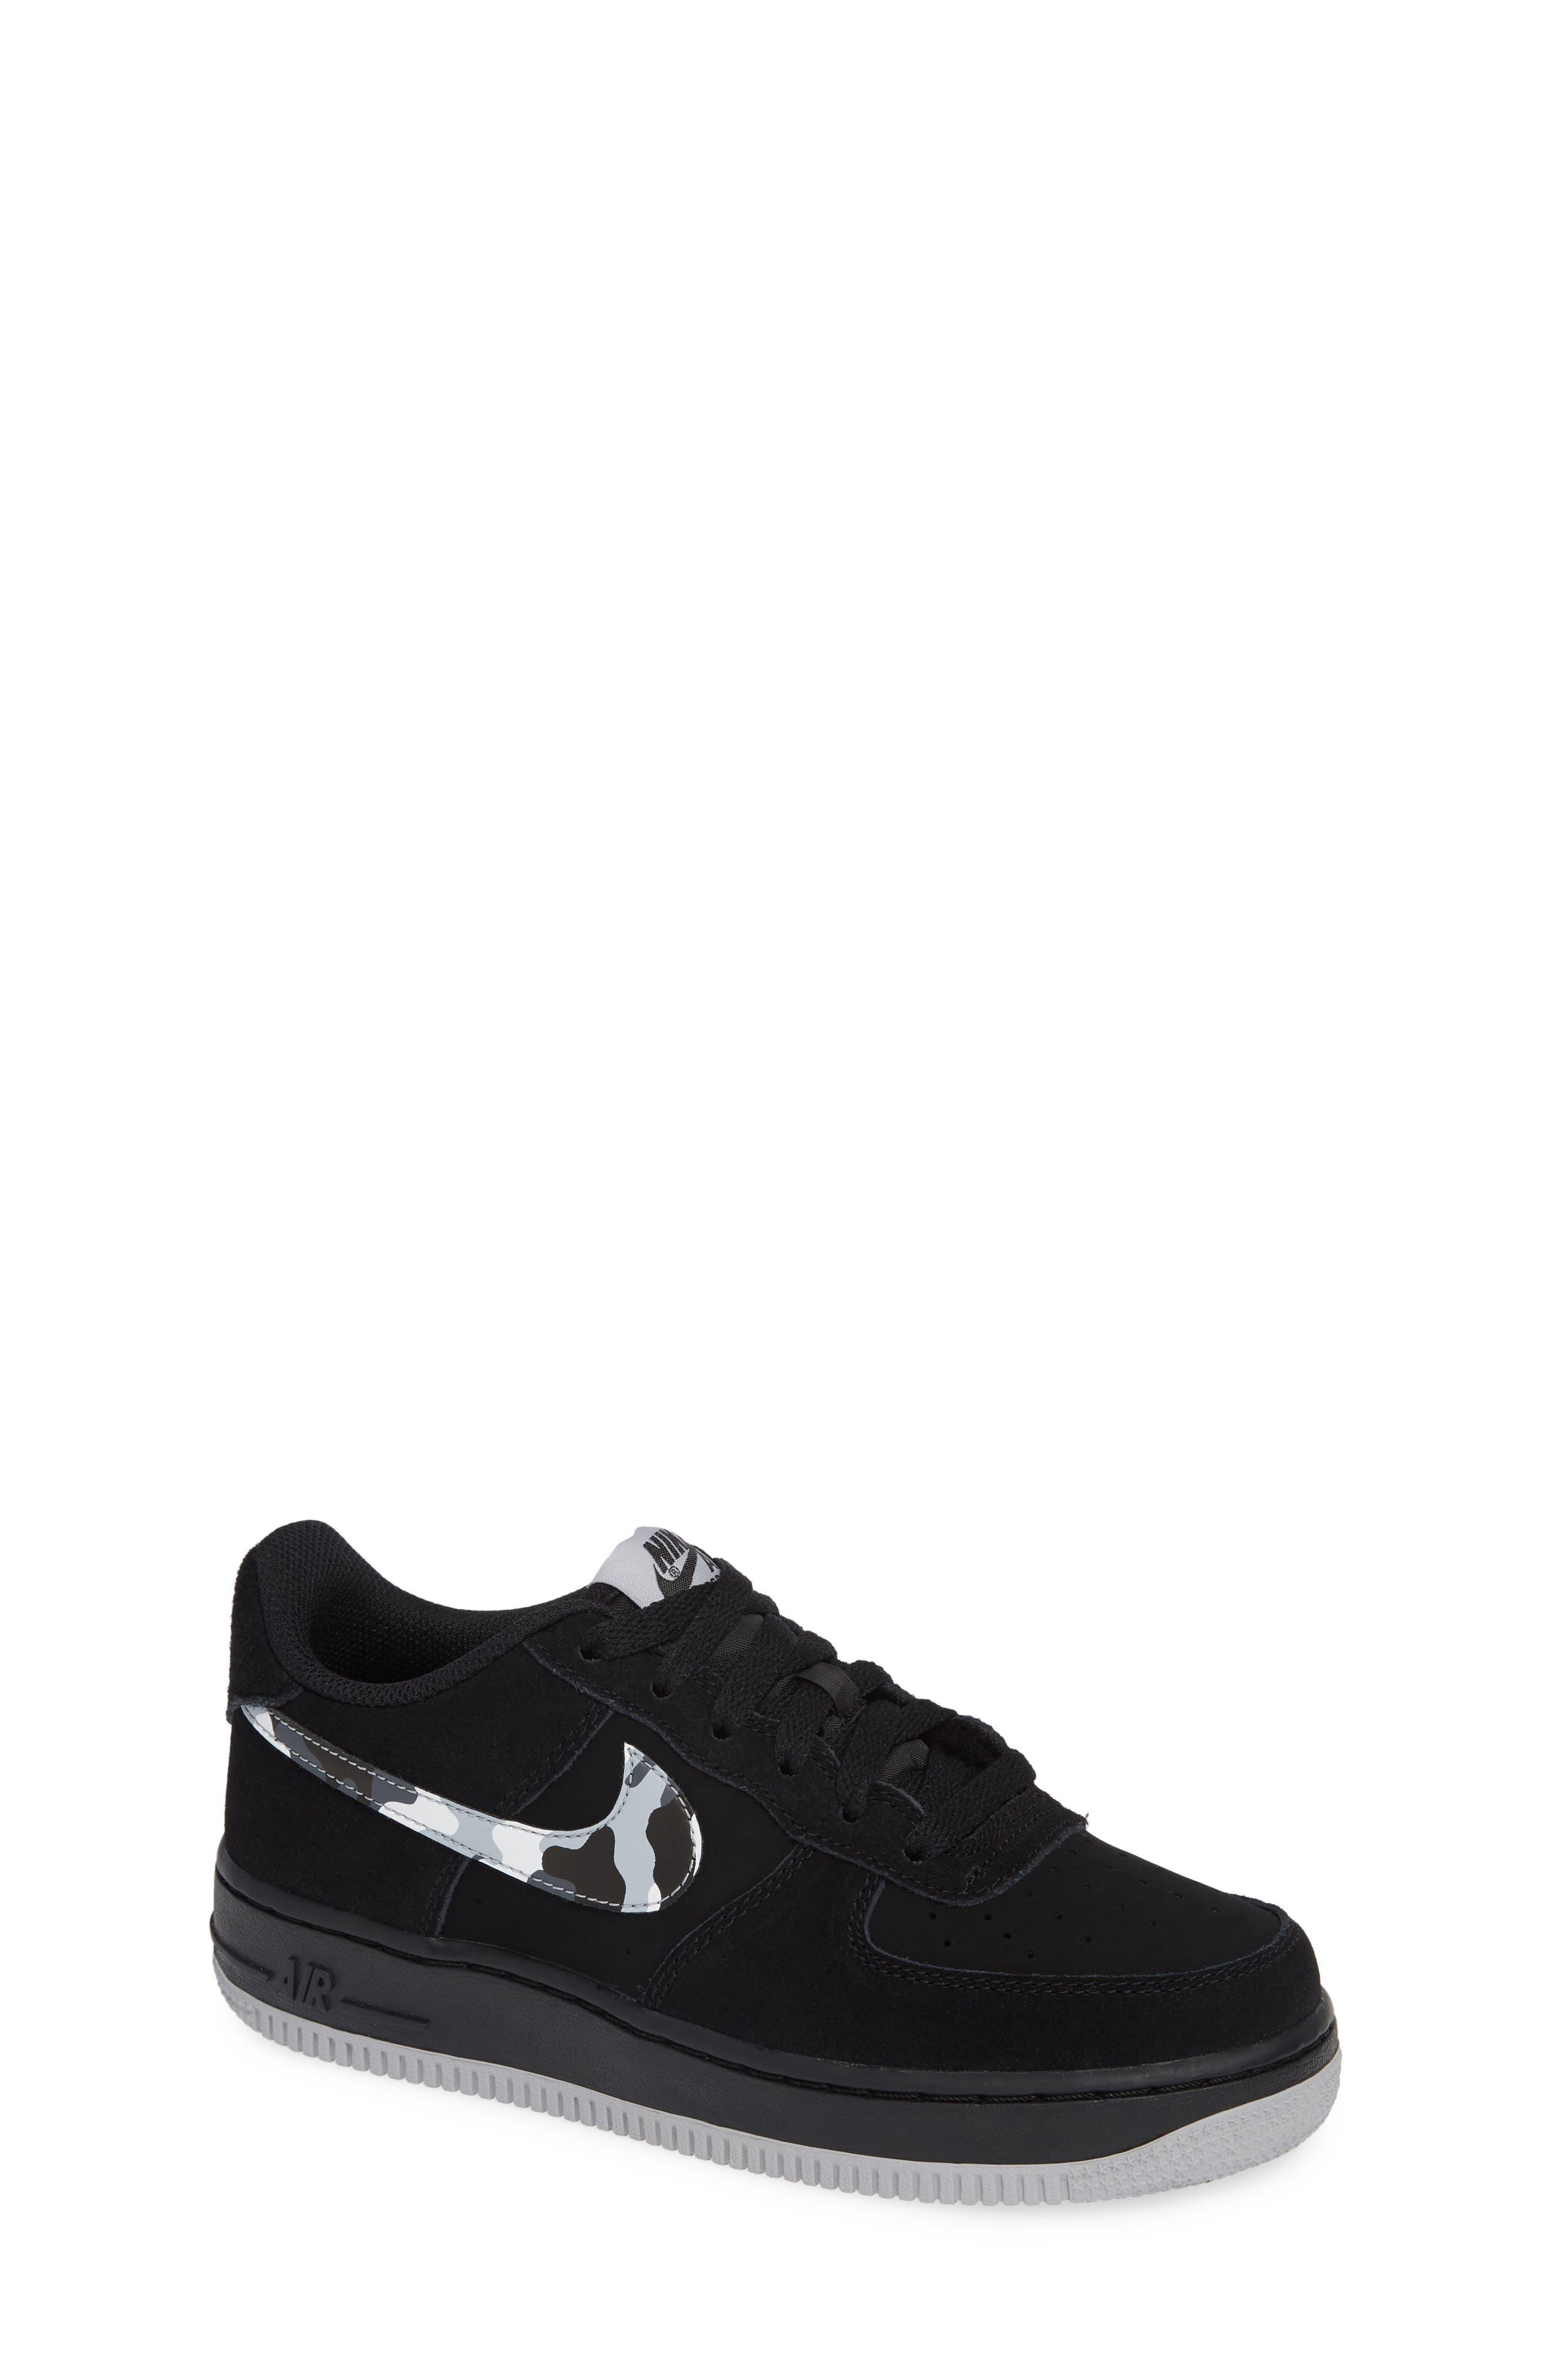 Air Force 1 Sneaker,                             Main thumbnail 1, color,                             BLACK/ GREY/ WHITE